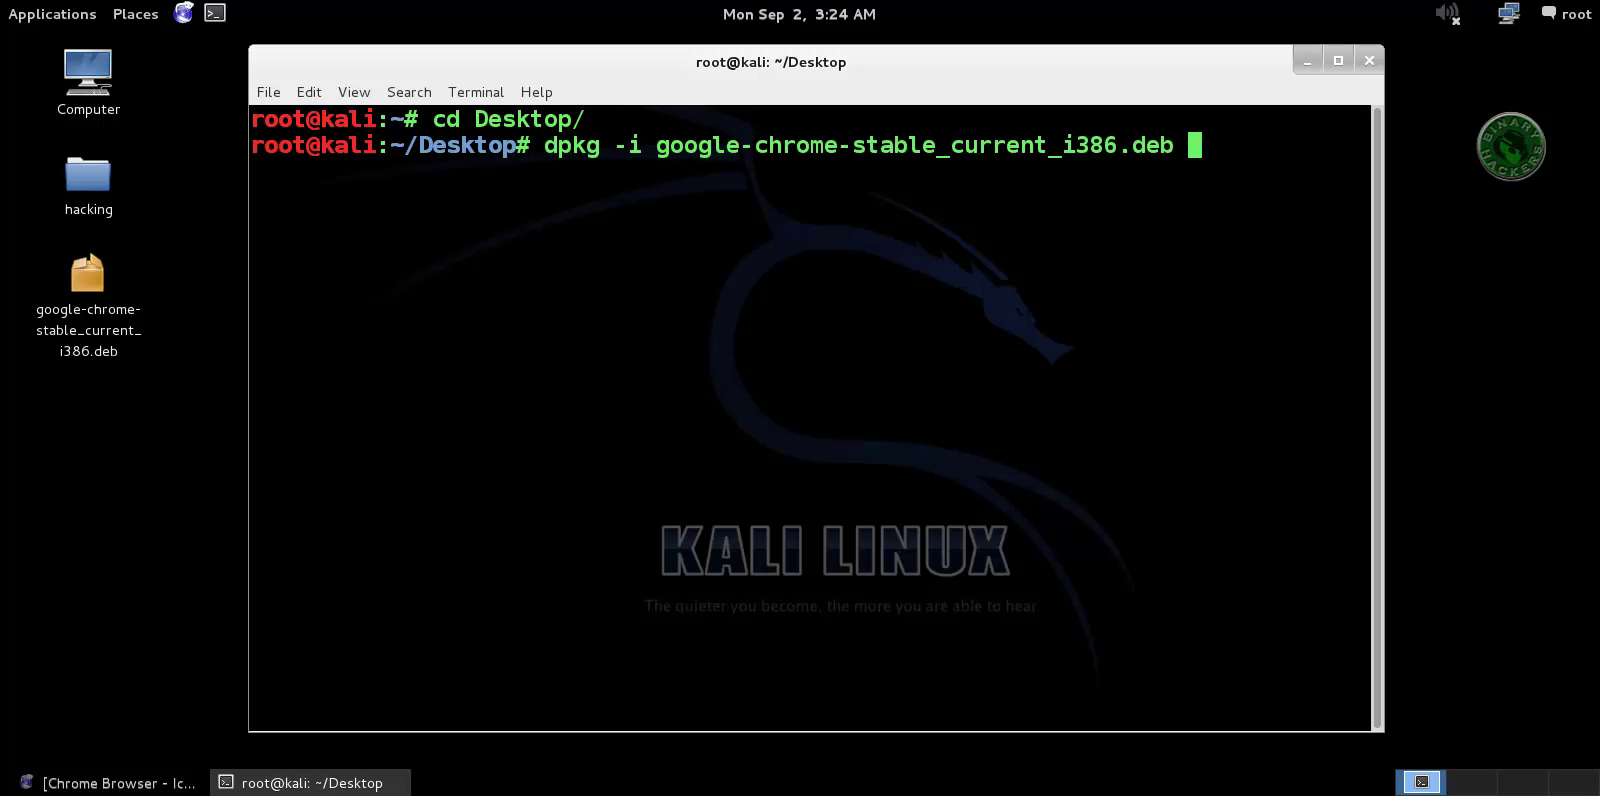 google chrome download kali linux